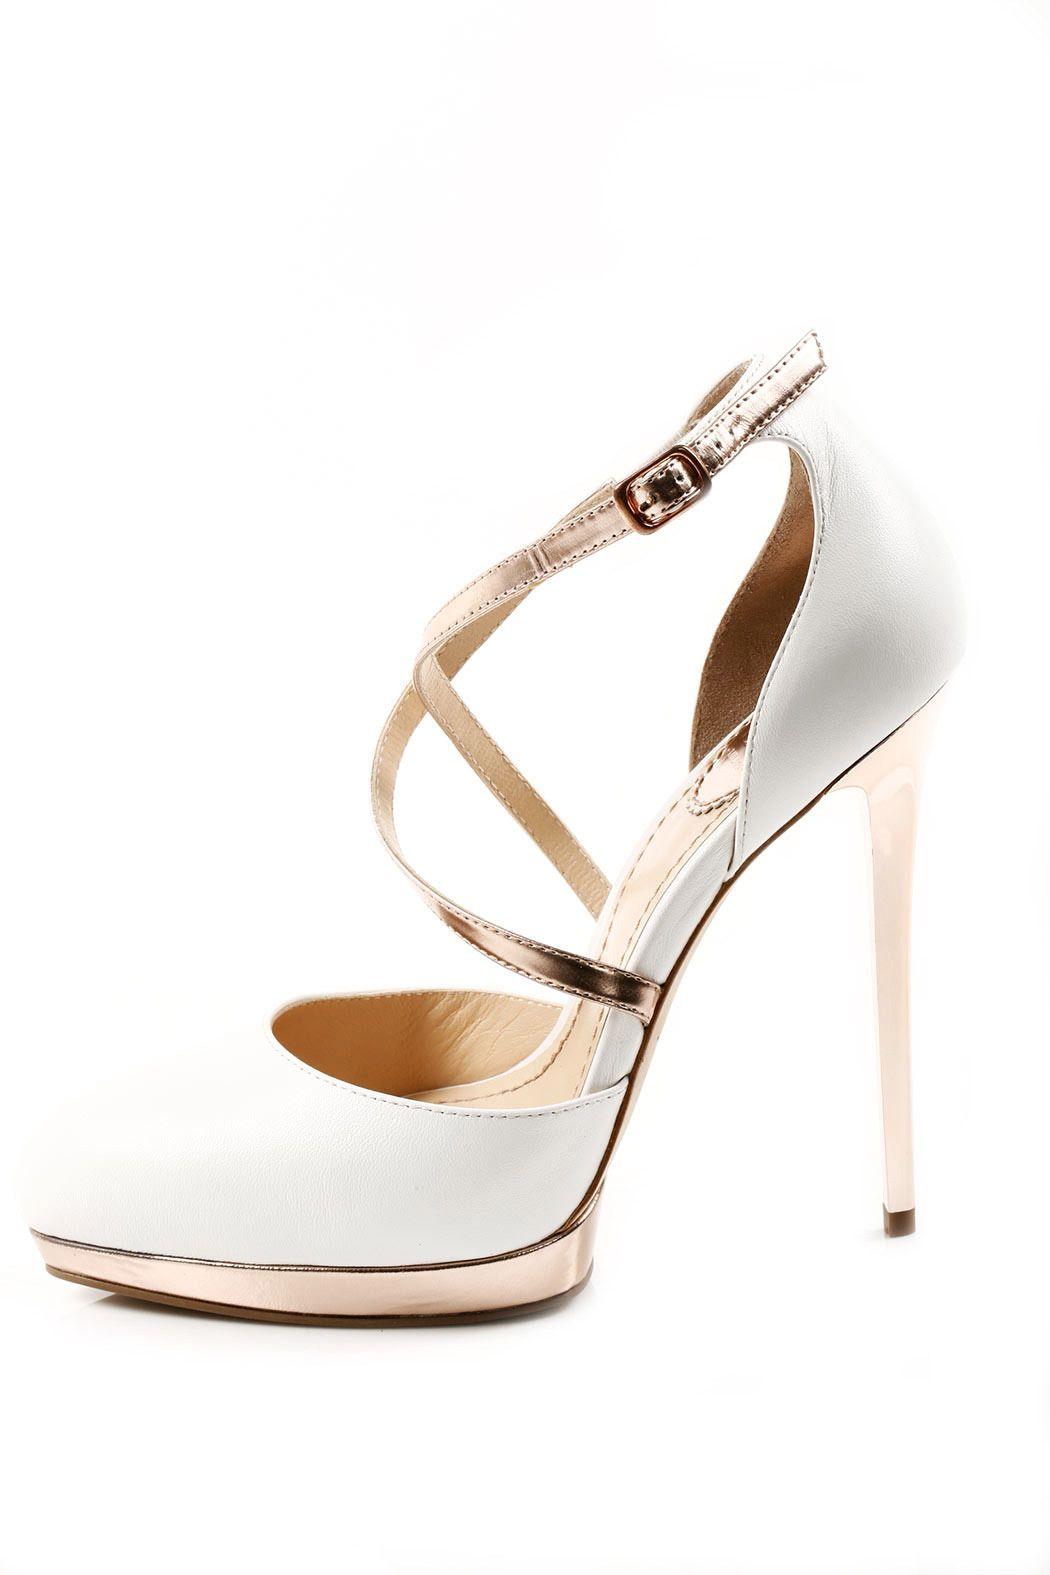 Leather Stiletto Pump   Chic high heels